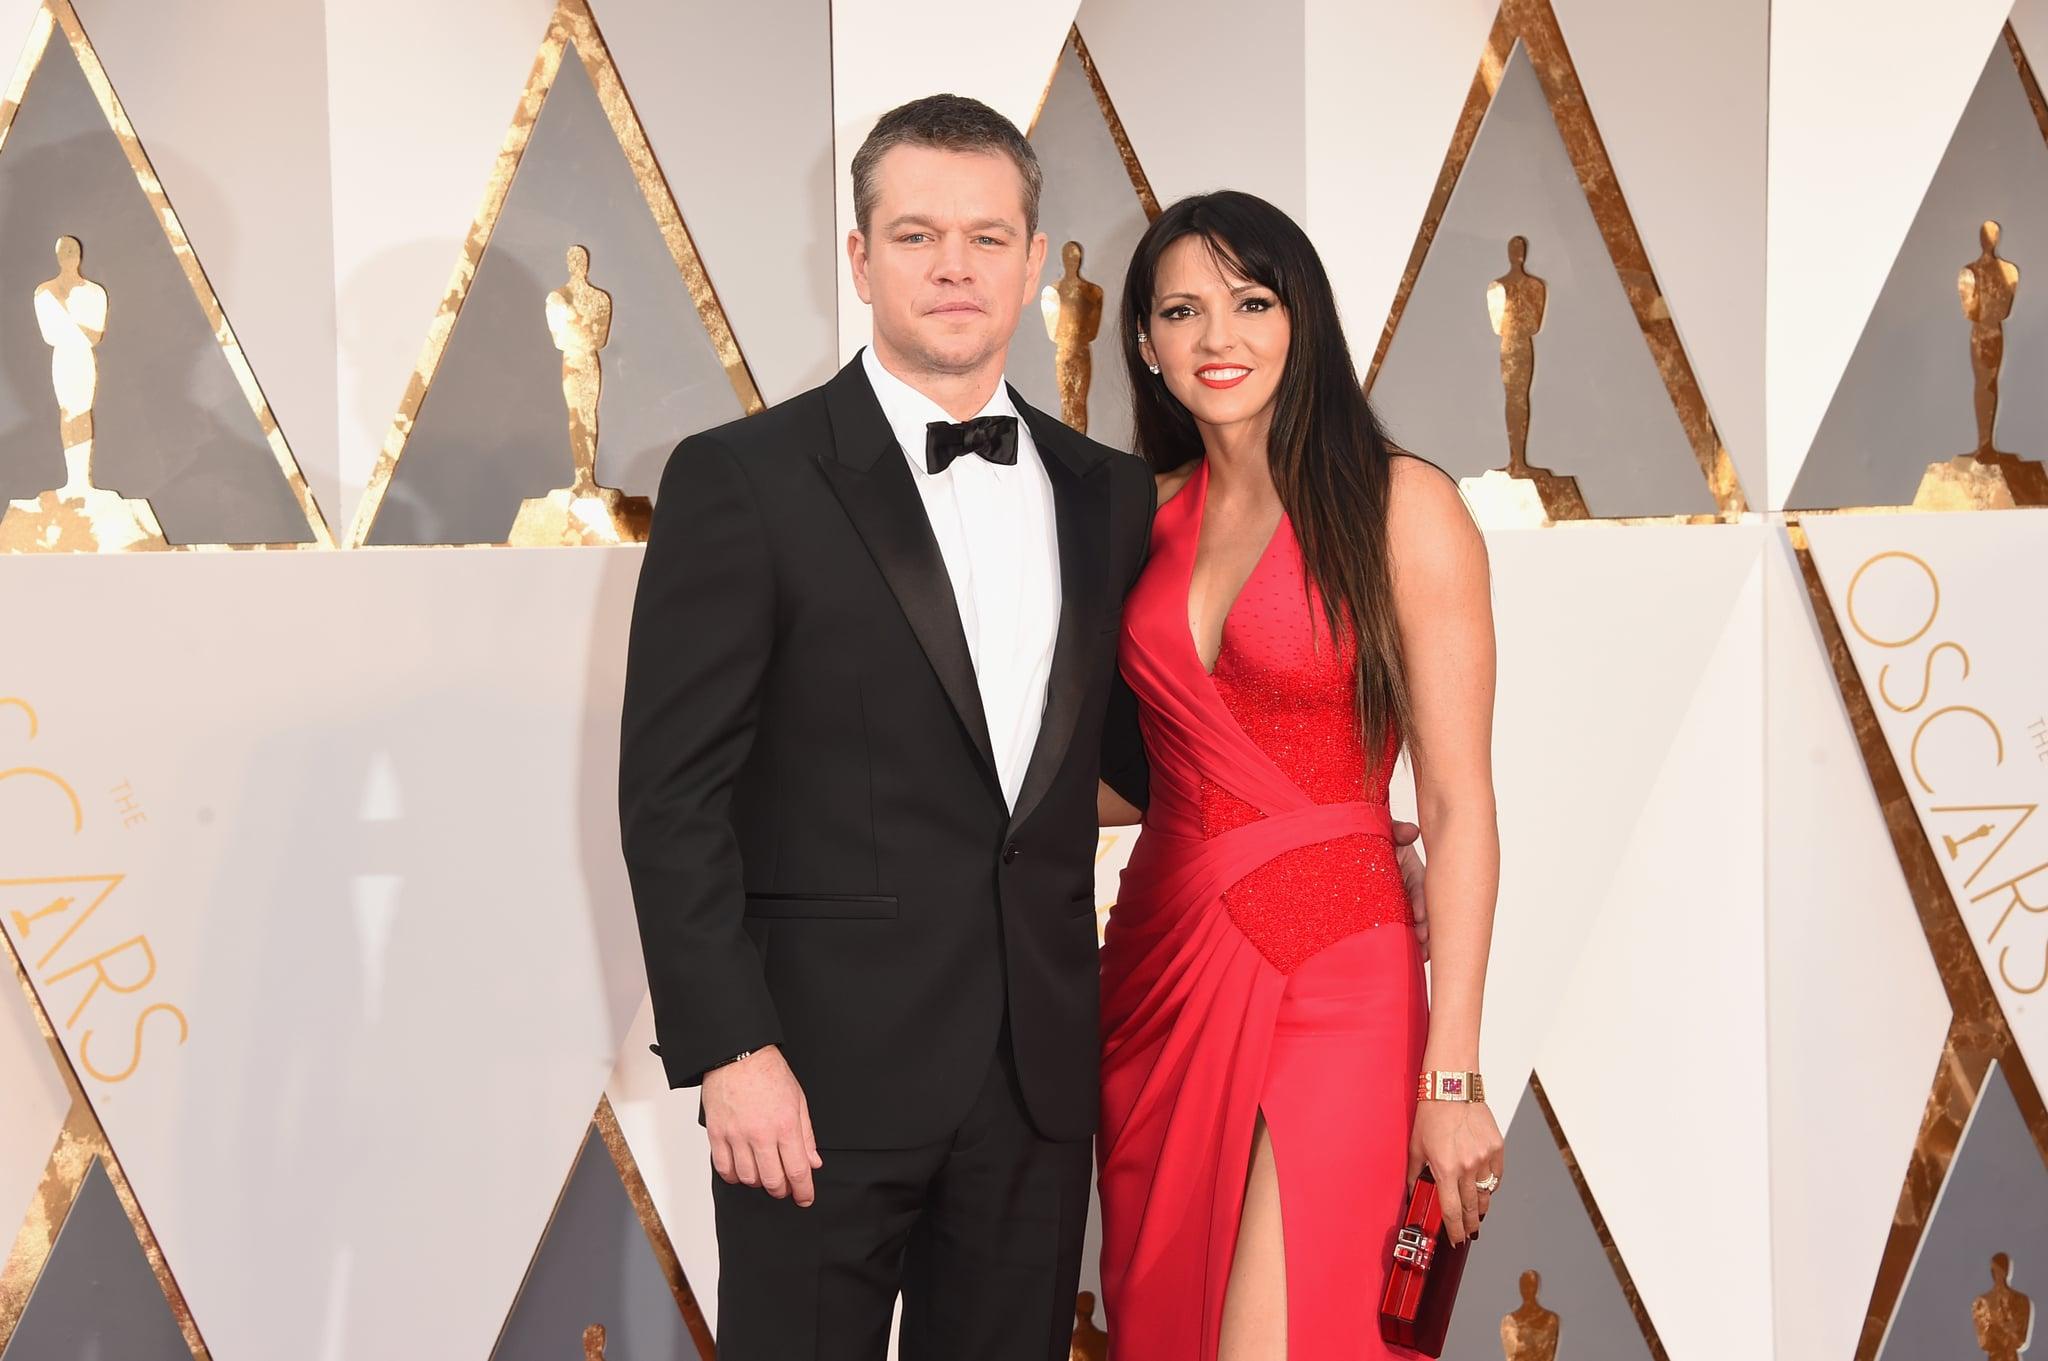 How Did Matt Damon Meet His Wife? | POPSUGAR Celebrity